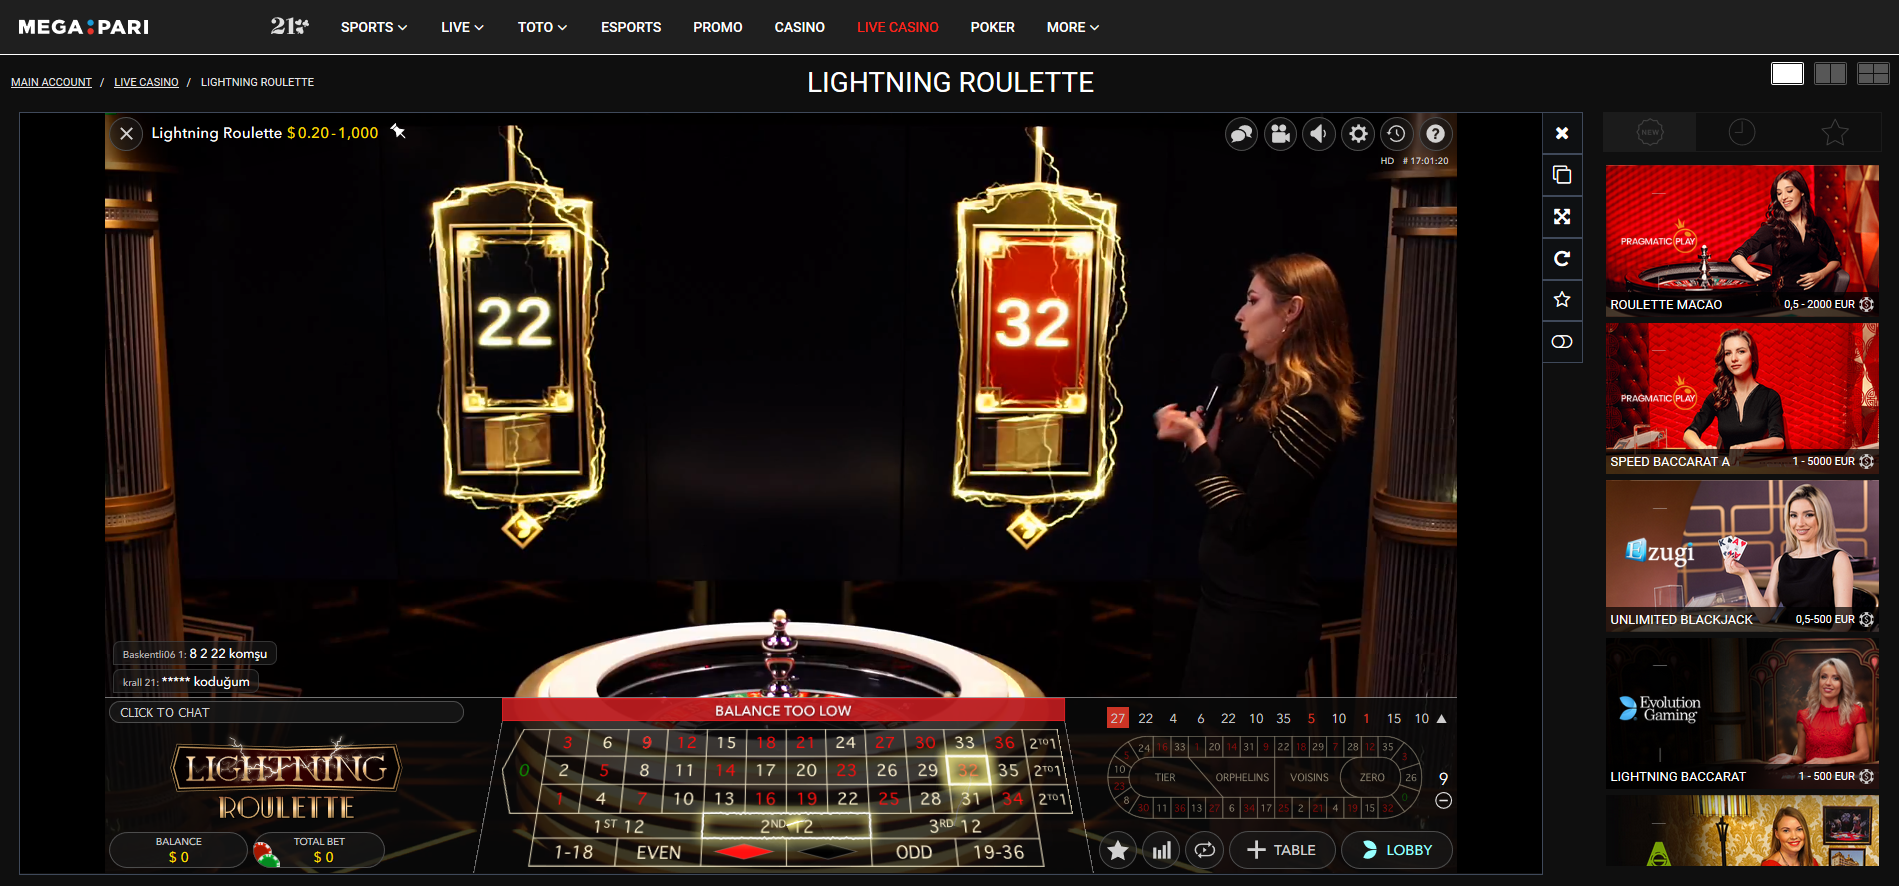 megapari lightning roulette - european roulette - game show - 22 - 32 - lucky numbers - wheel